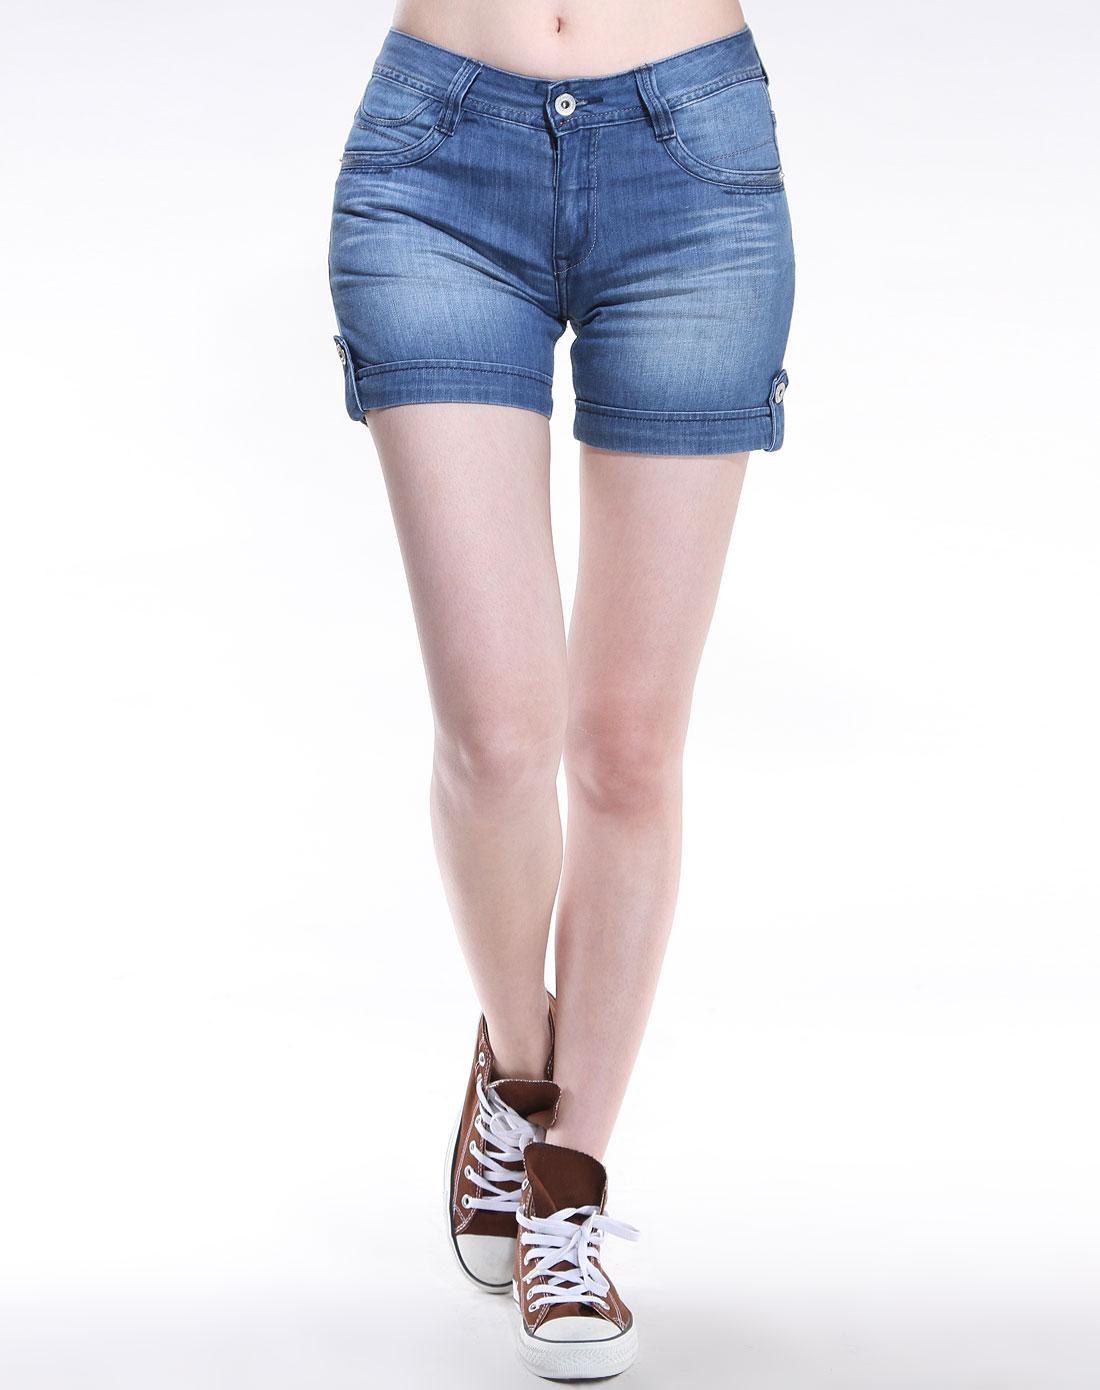 cardin-女款牛仔蓝色休闲牛仔短裤